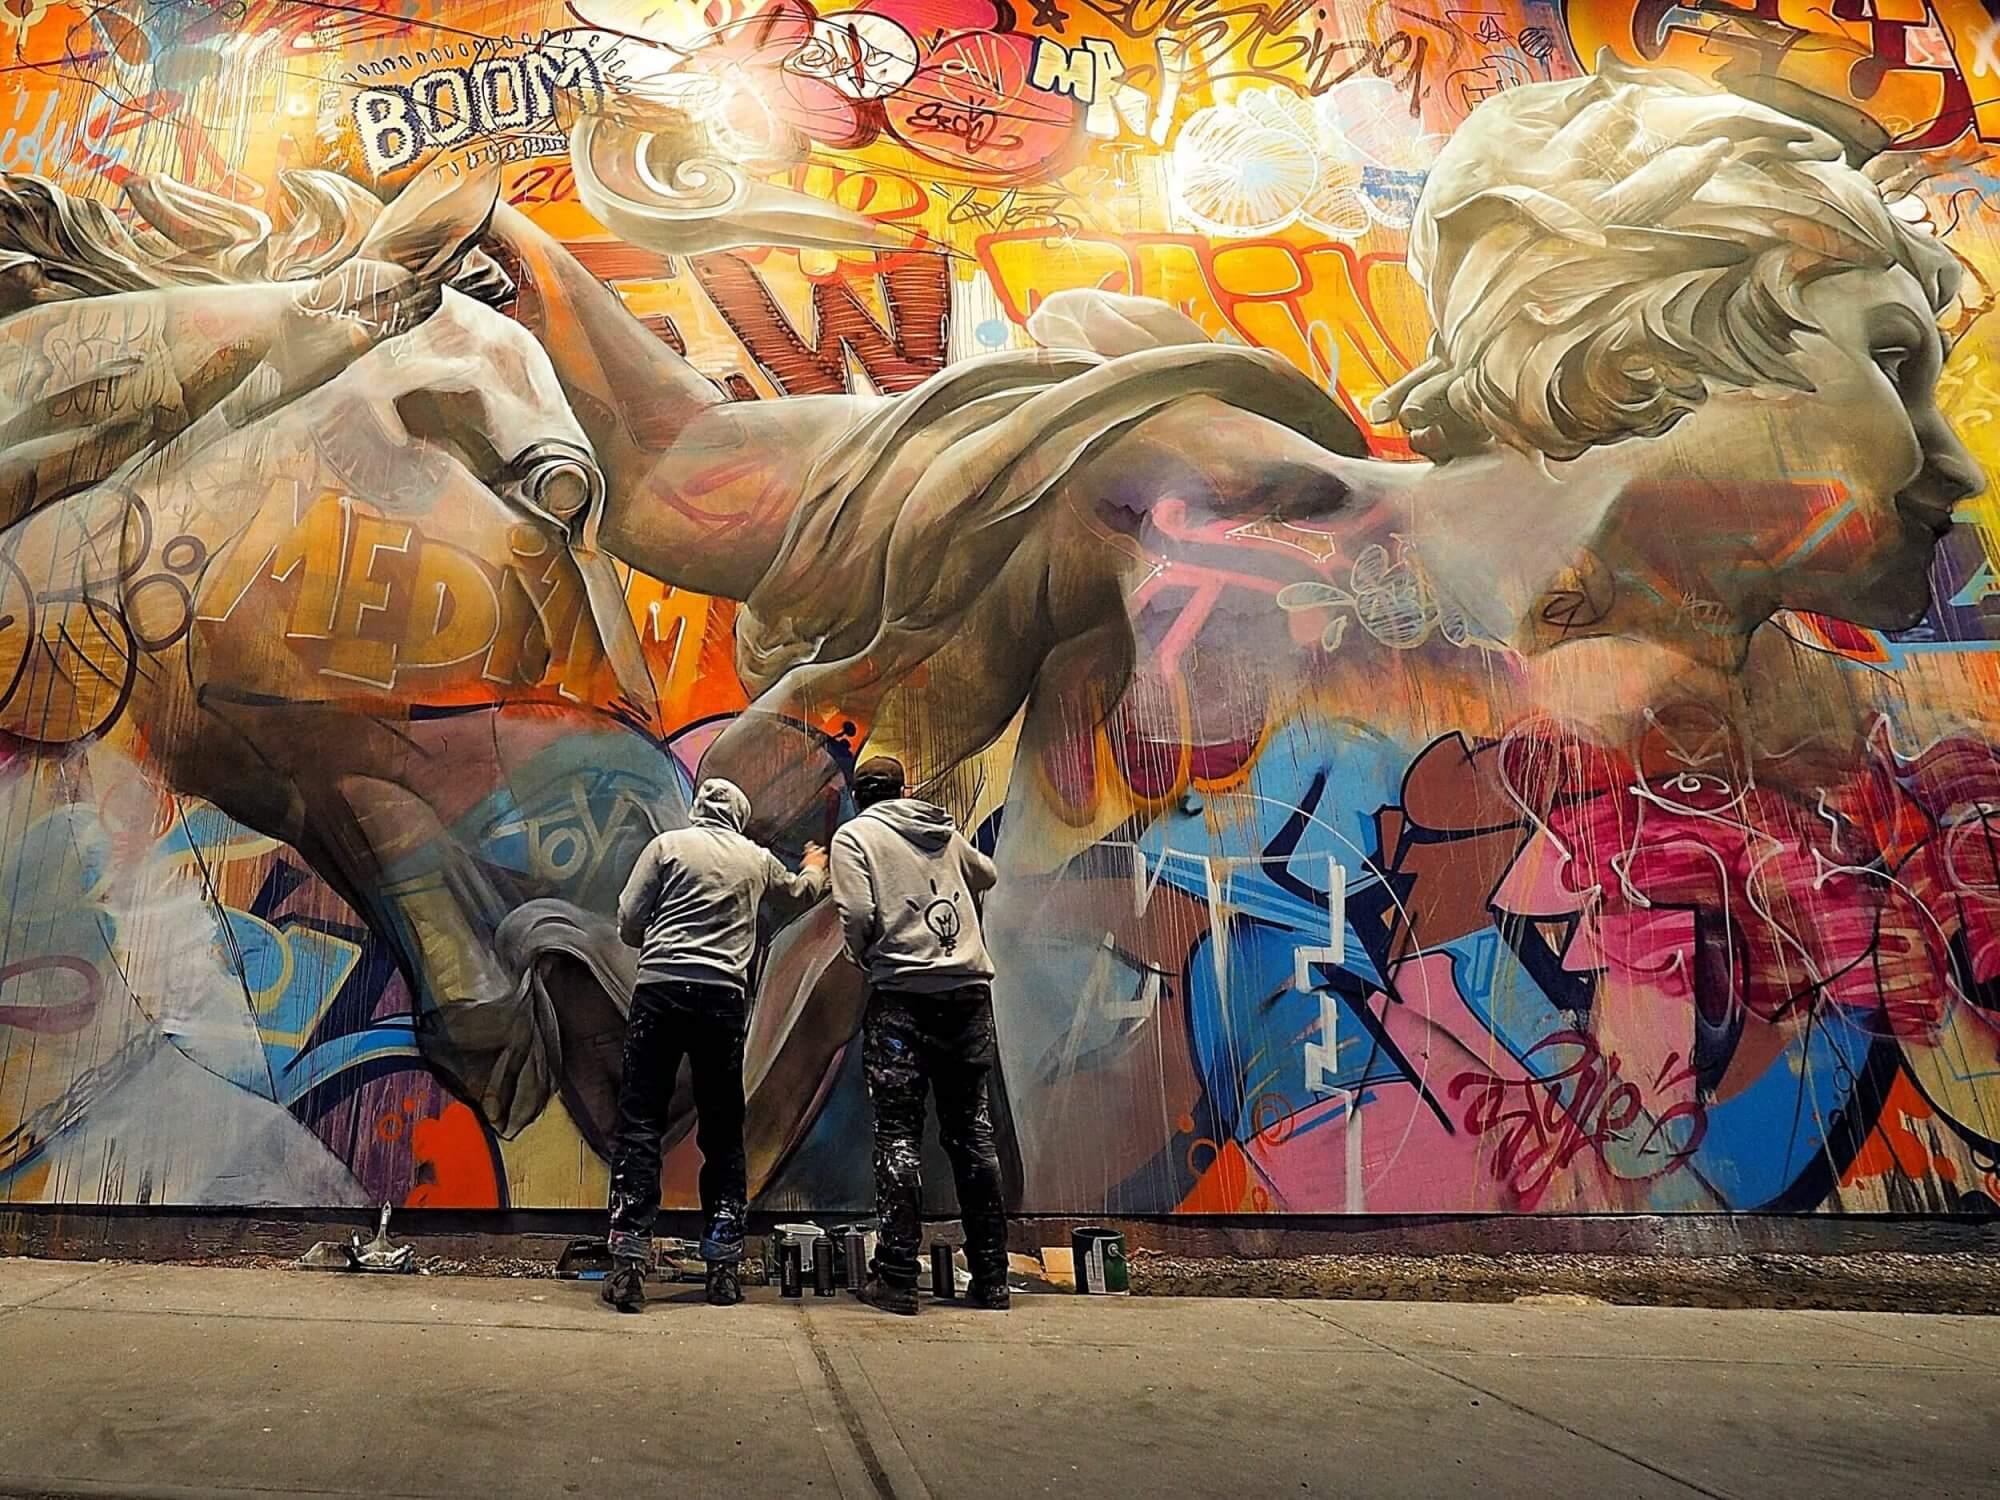 Incredible new mural by pichiavo on the iconic houston bowery graffiti wall new york 2017 graffitistreet com news